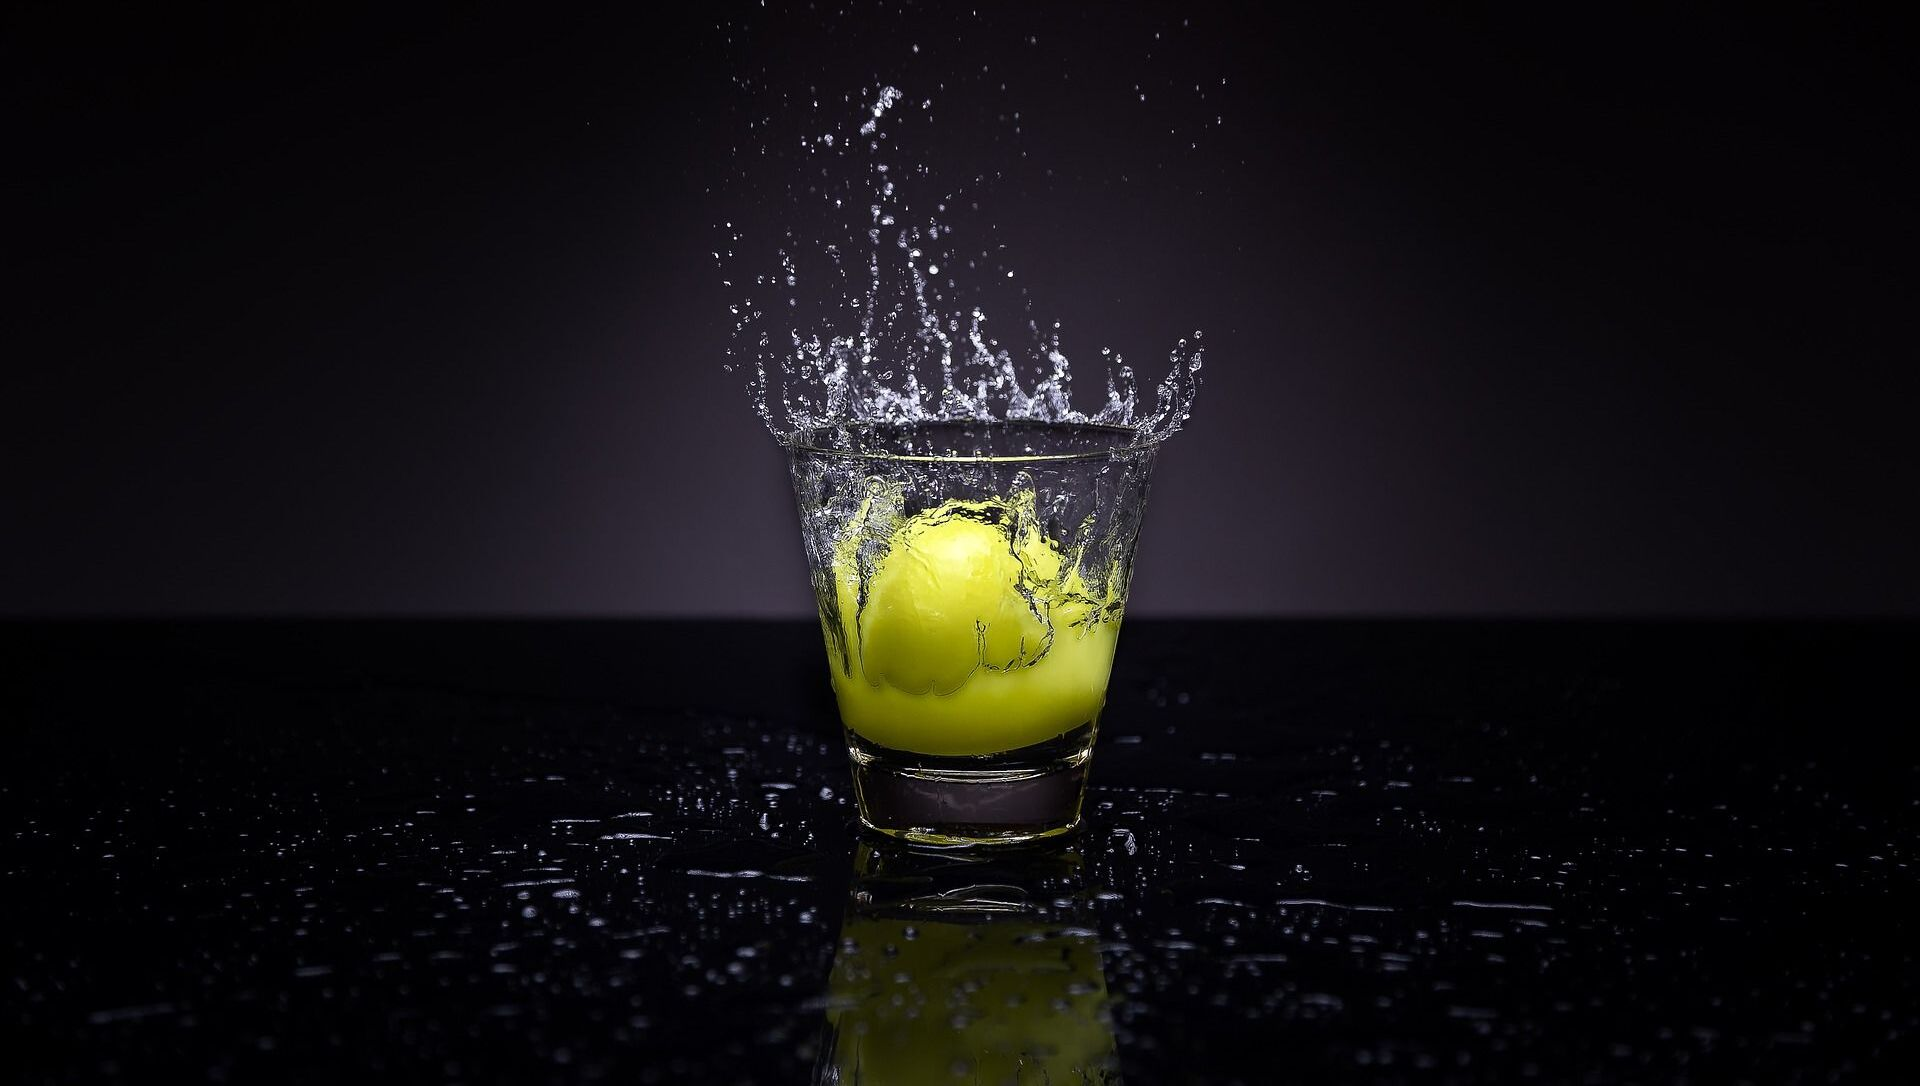 Voda s citronem - Sputnik Česká republika, 1920, 24.03.2021